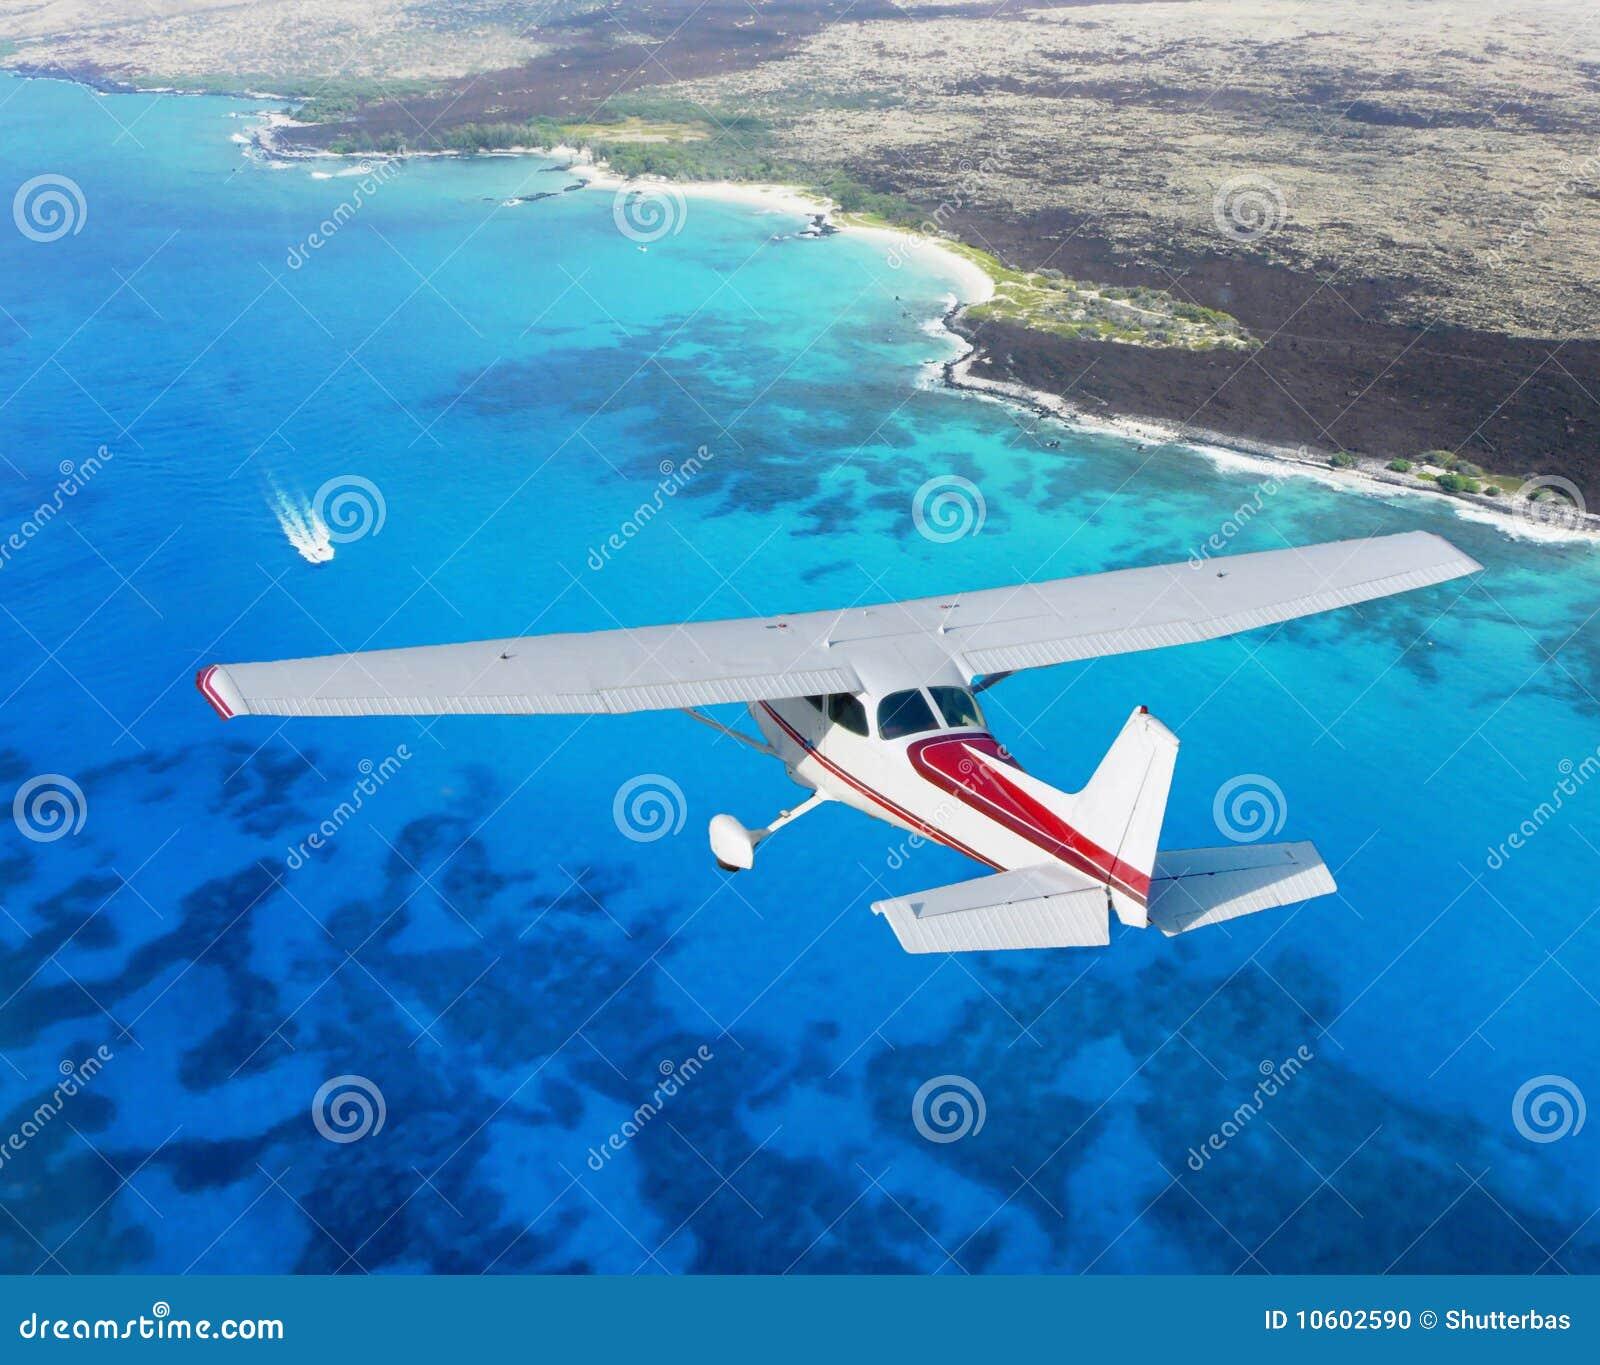 Cessna cruising